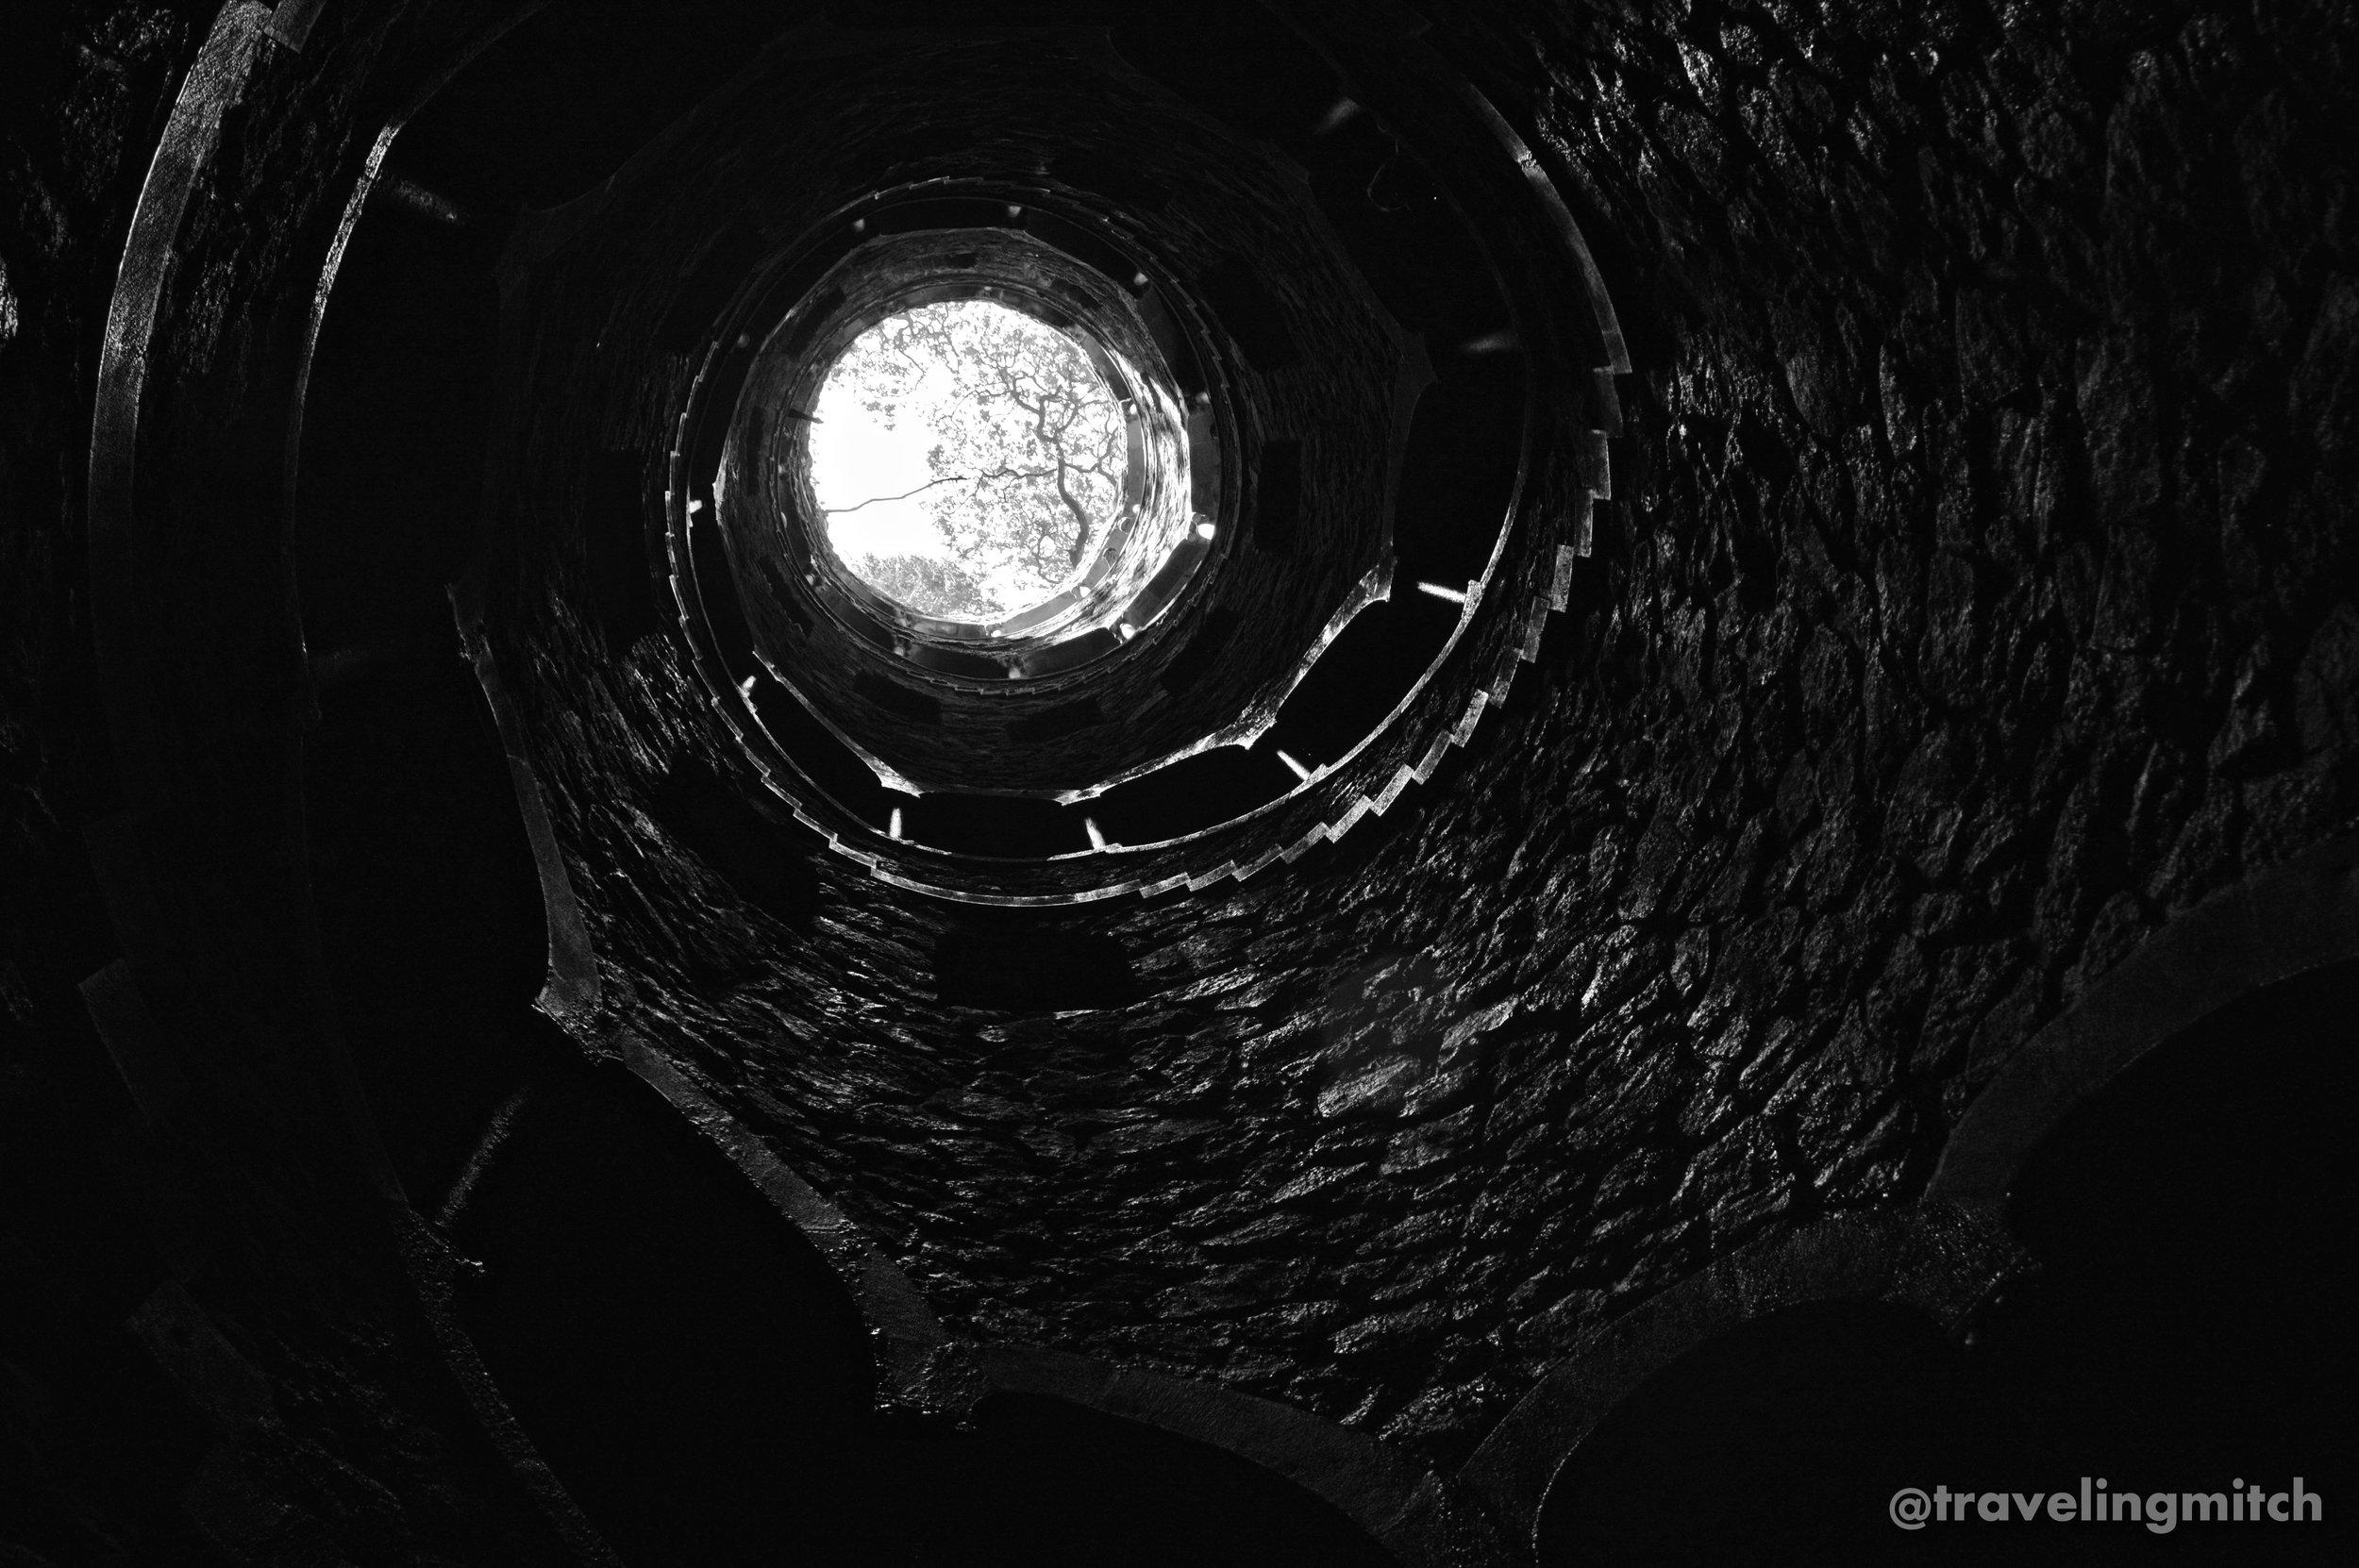 The Initiation Well - Quinta da Regaleira